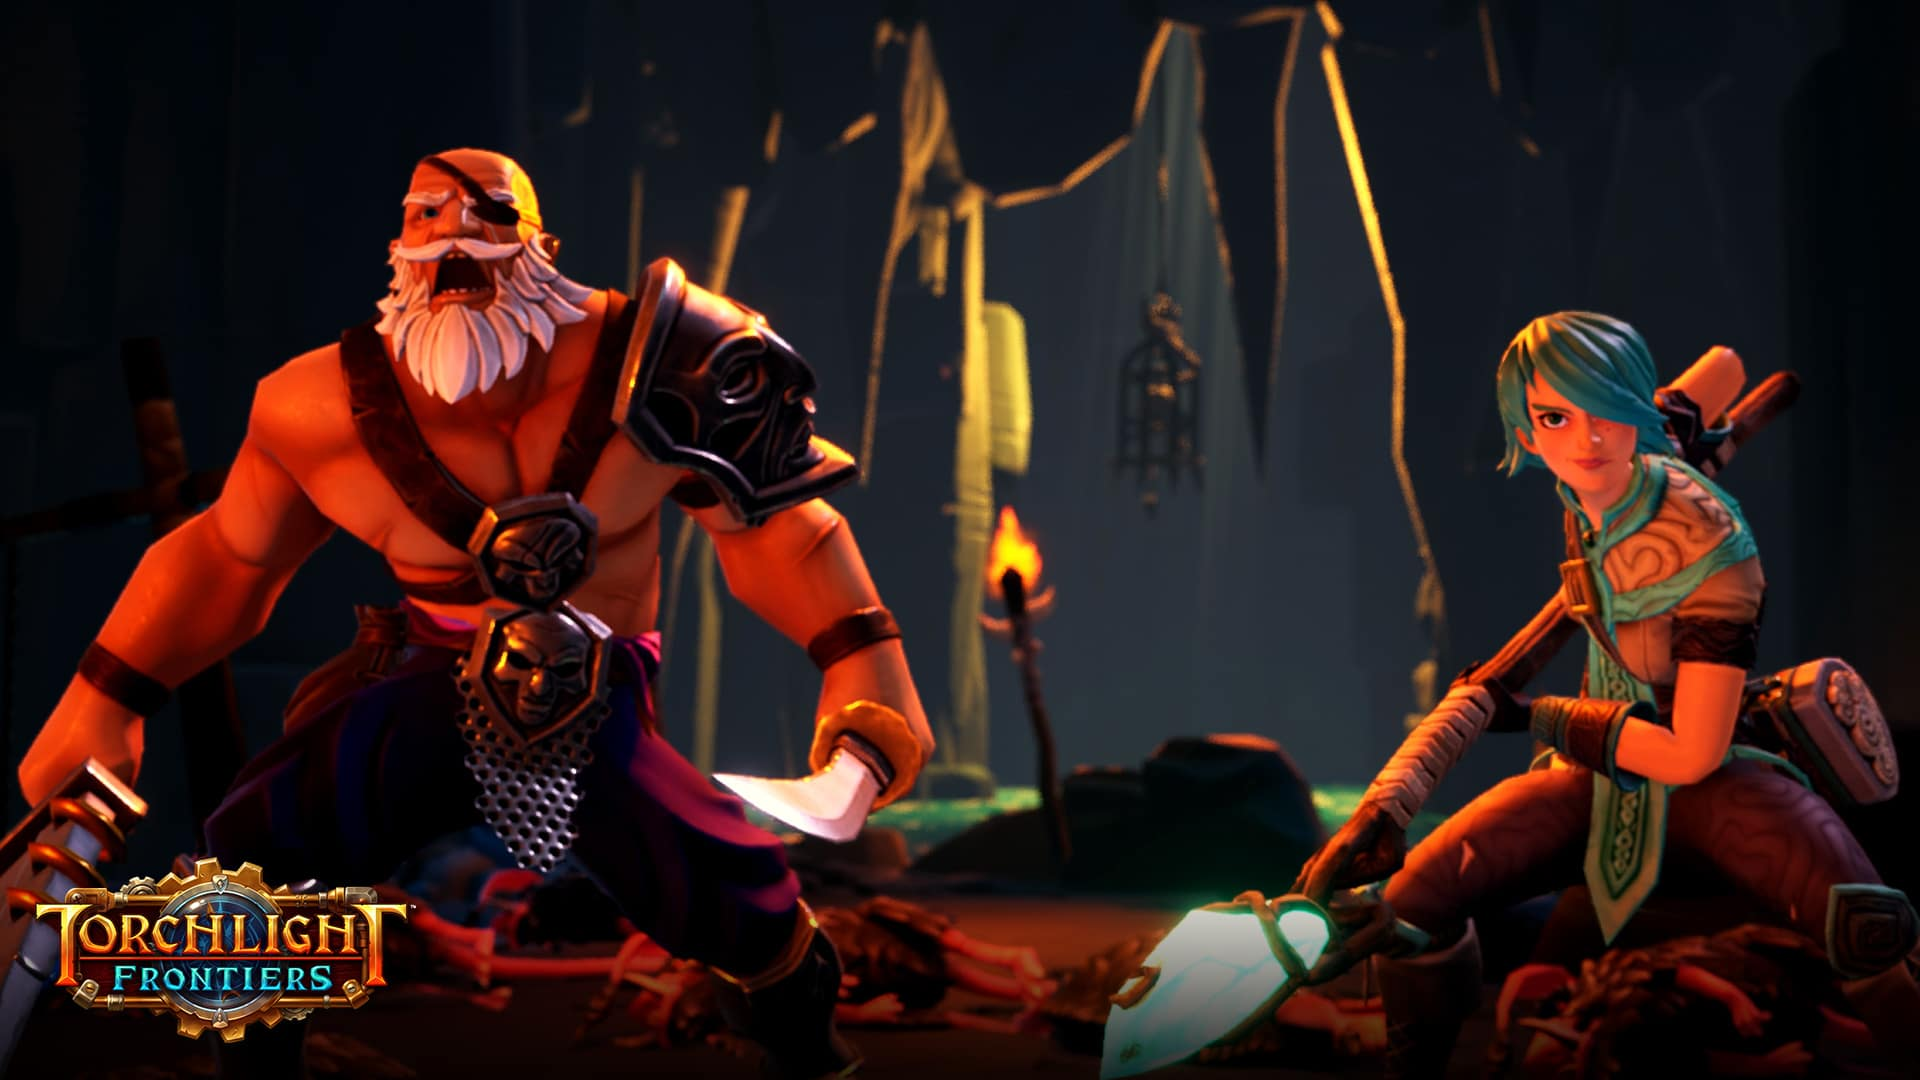 torchlight Frontiers Screenshot